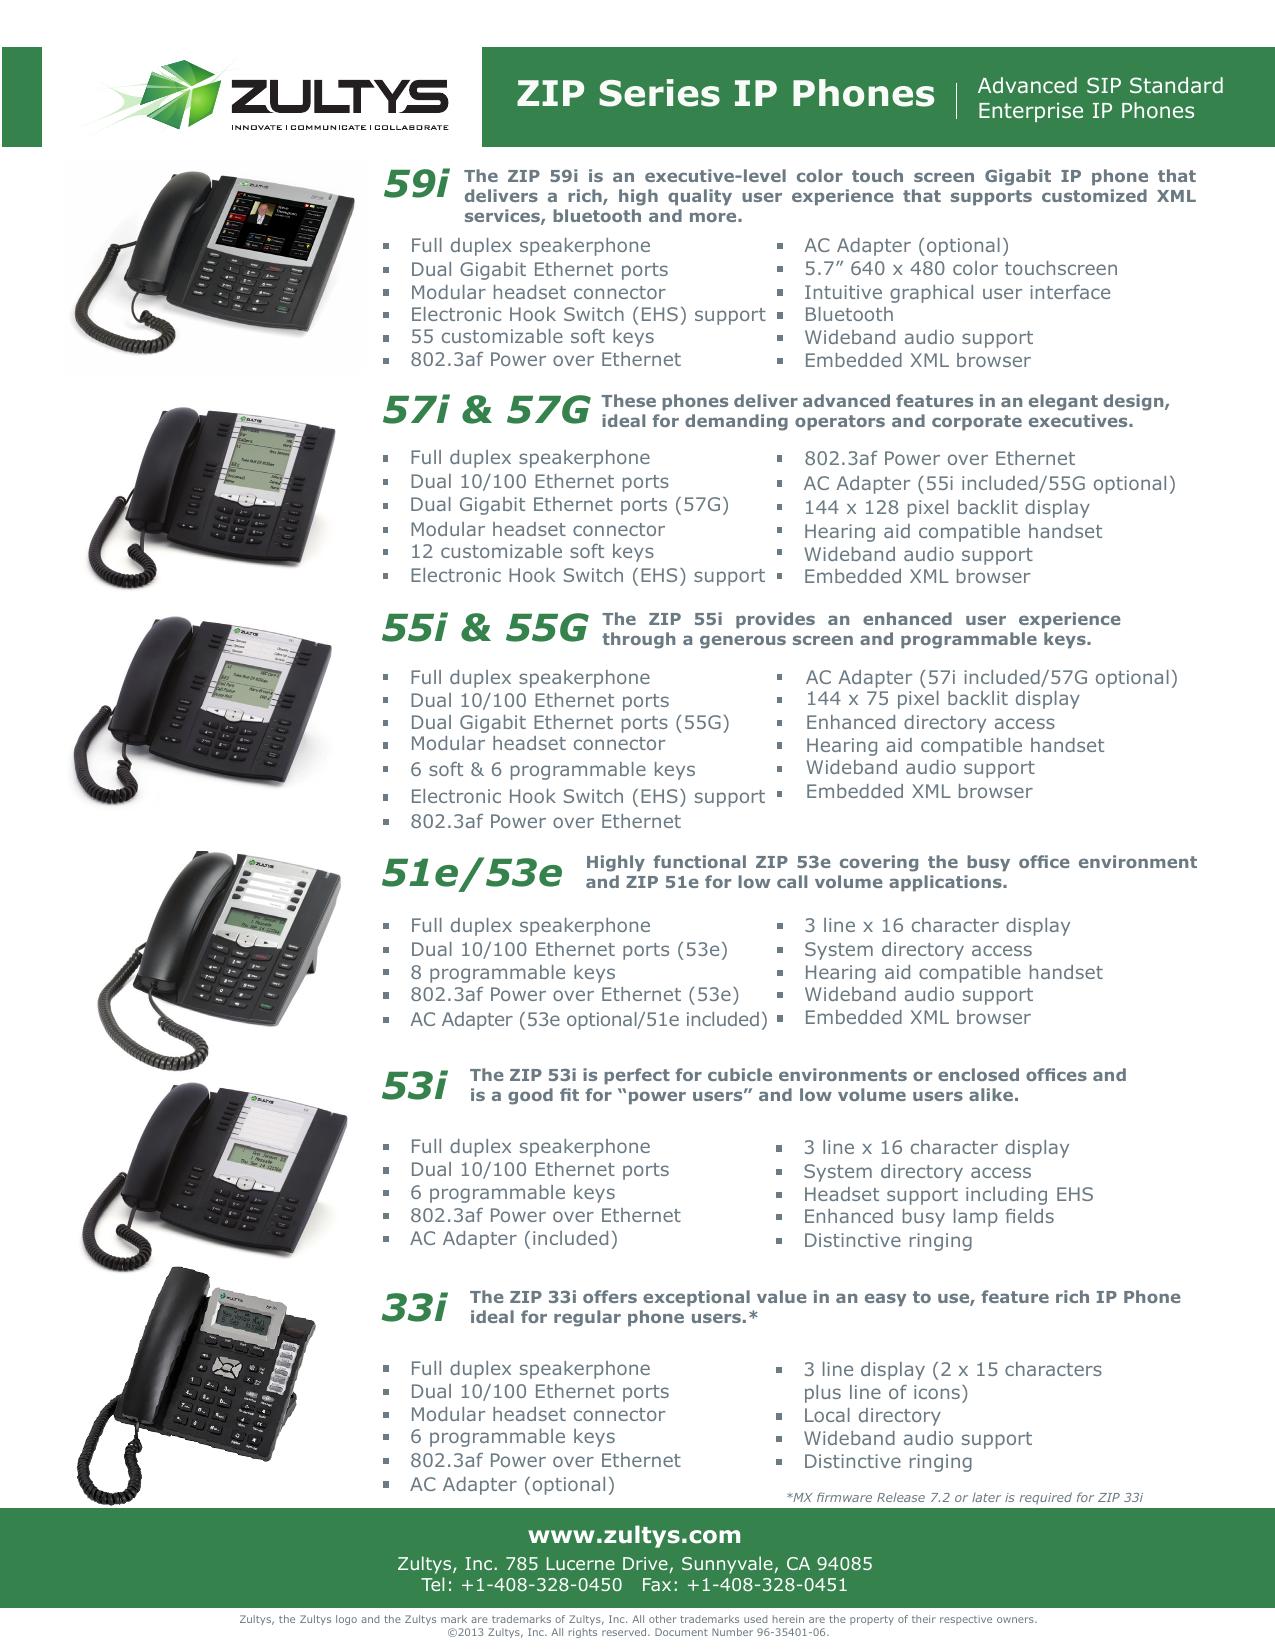 zip series ip phones manualzz com rh manualzz com